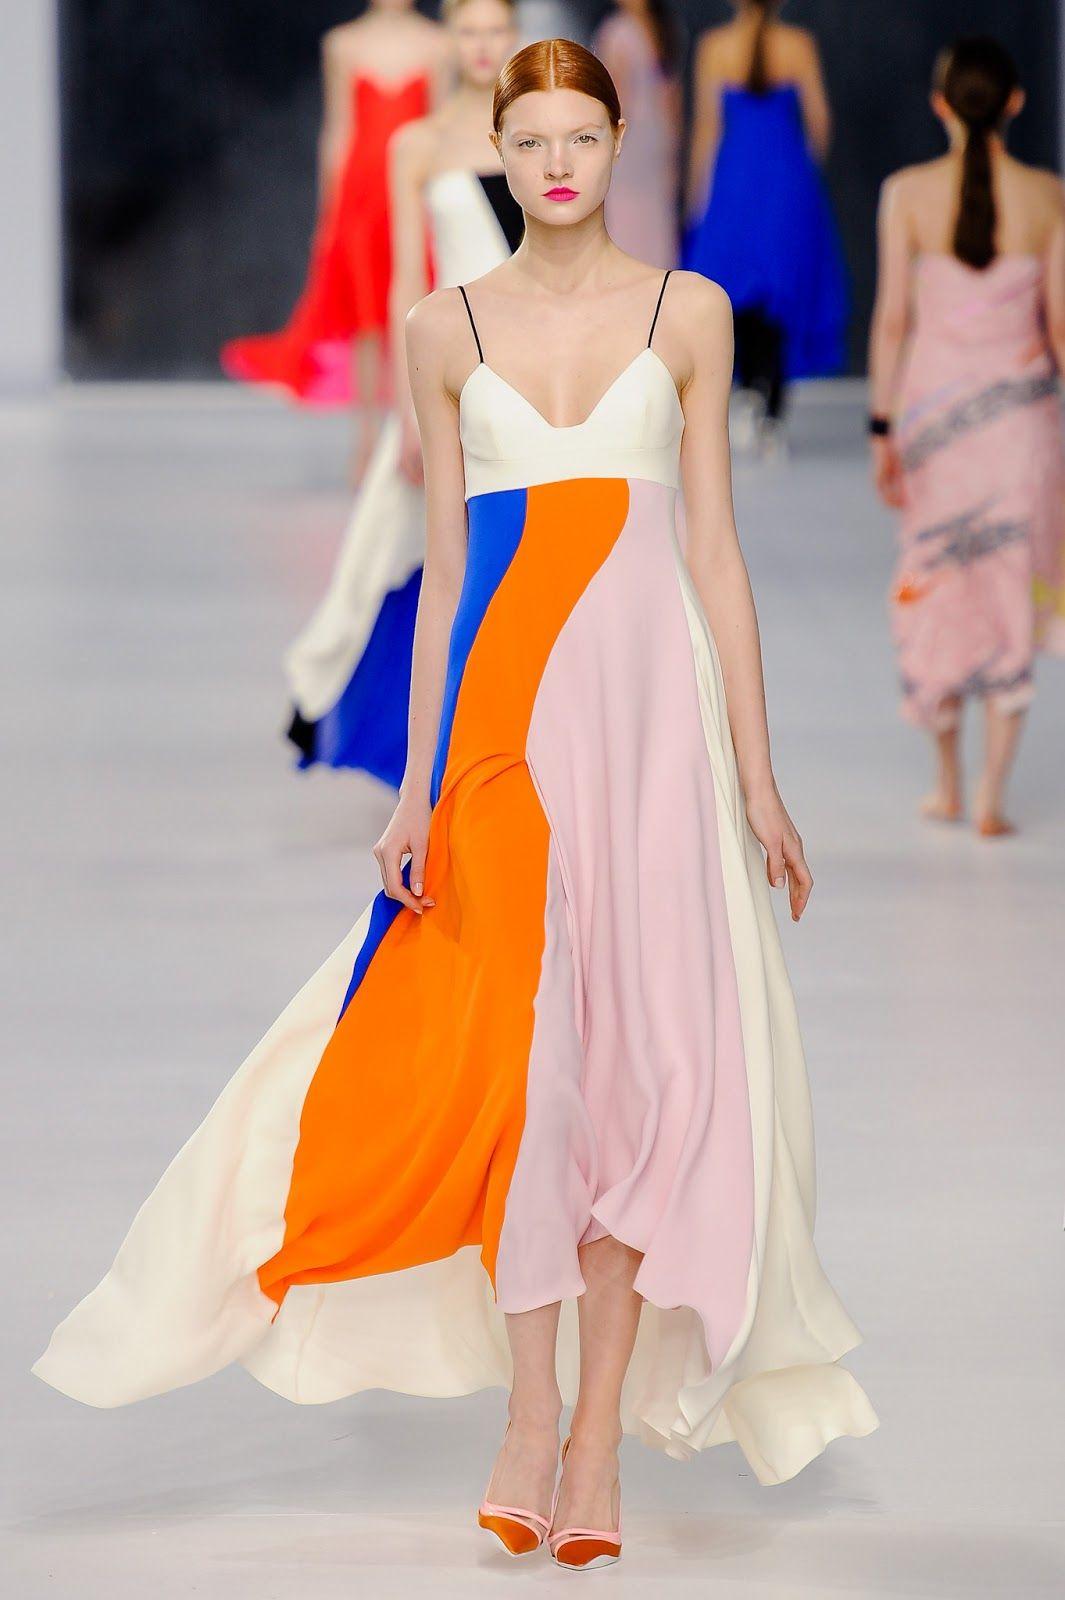 Princess elegant dresses